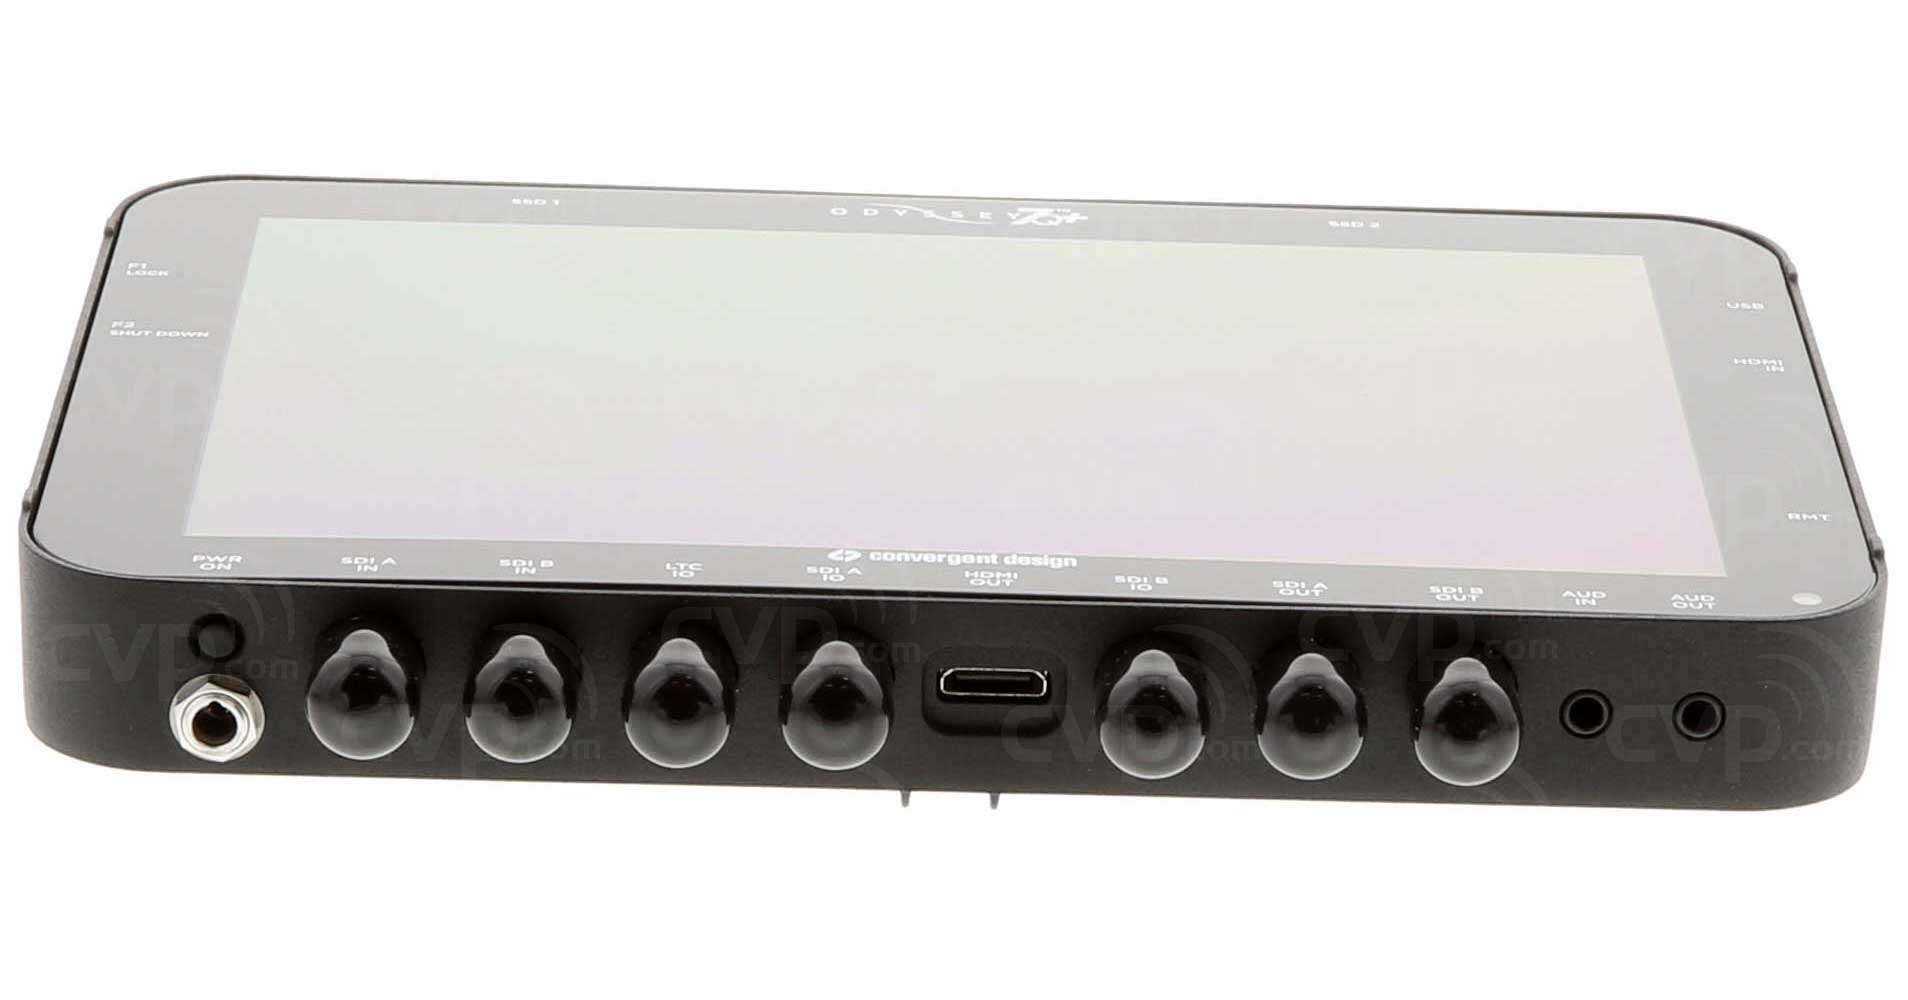 Ex-Demo CD-ODYSSEY-7Q Monitor & Multi-Format Recorder